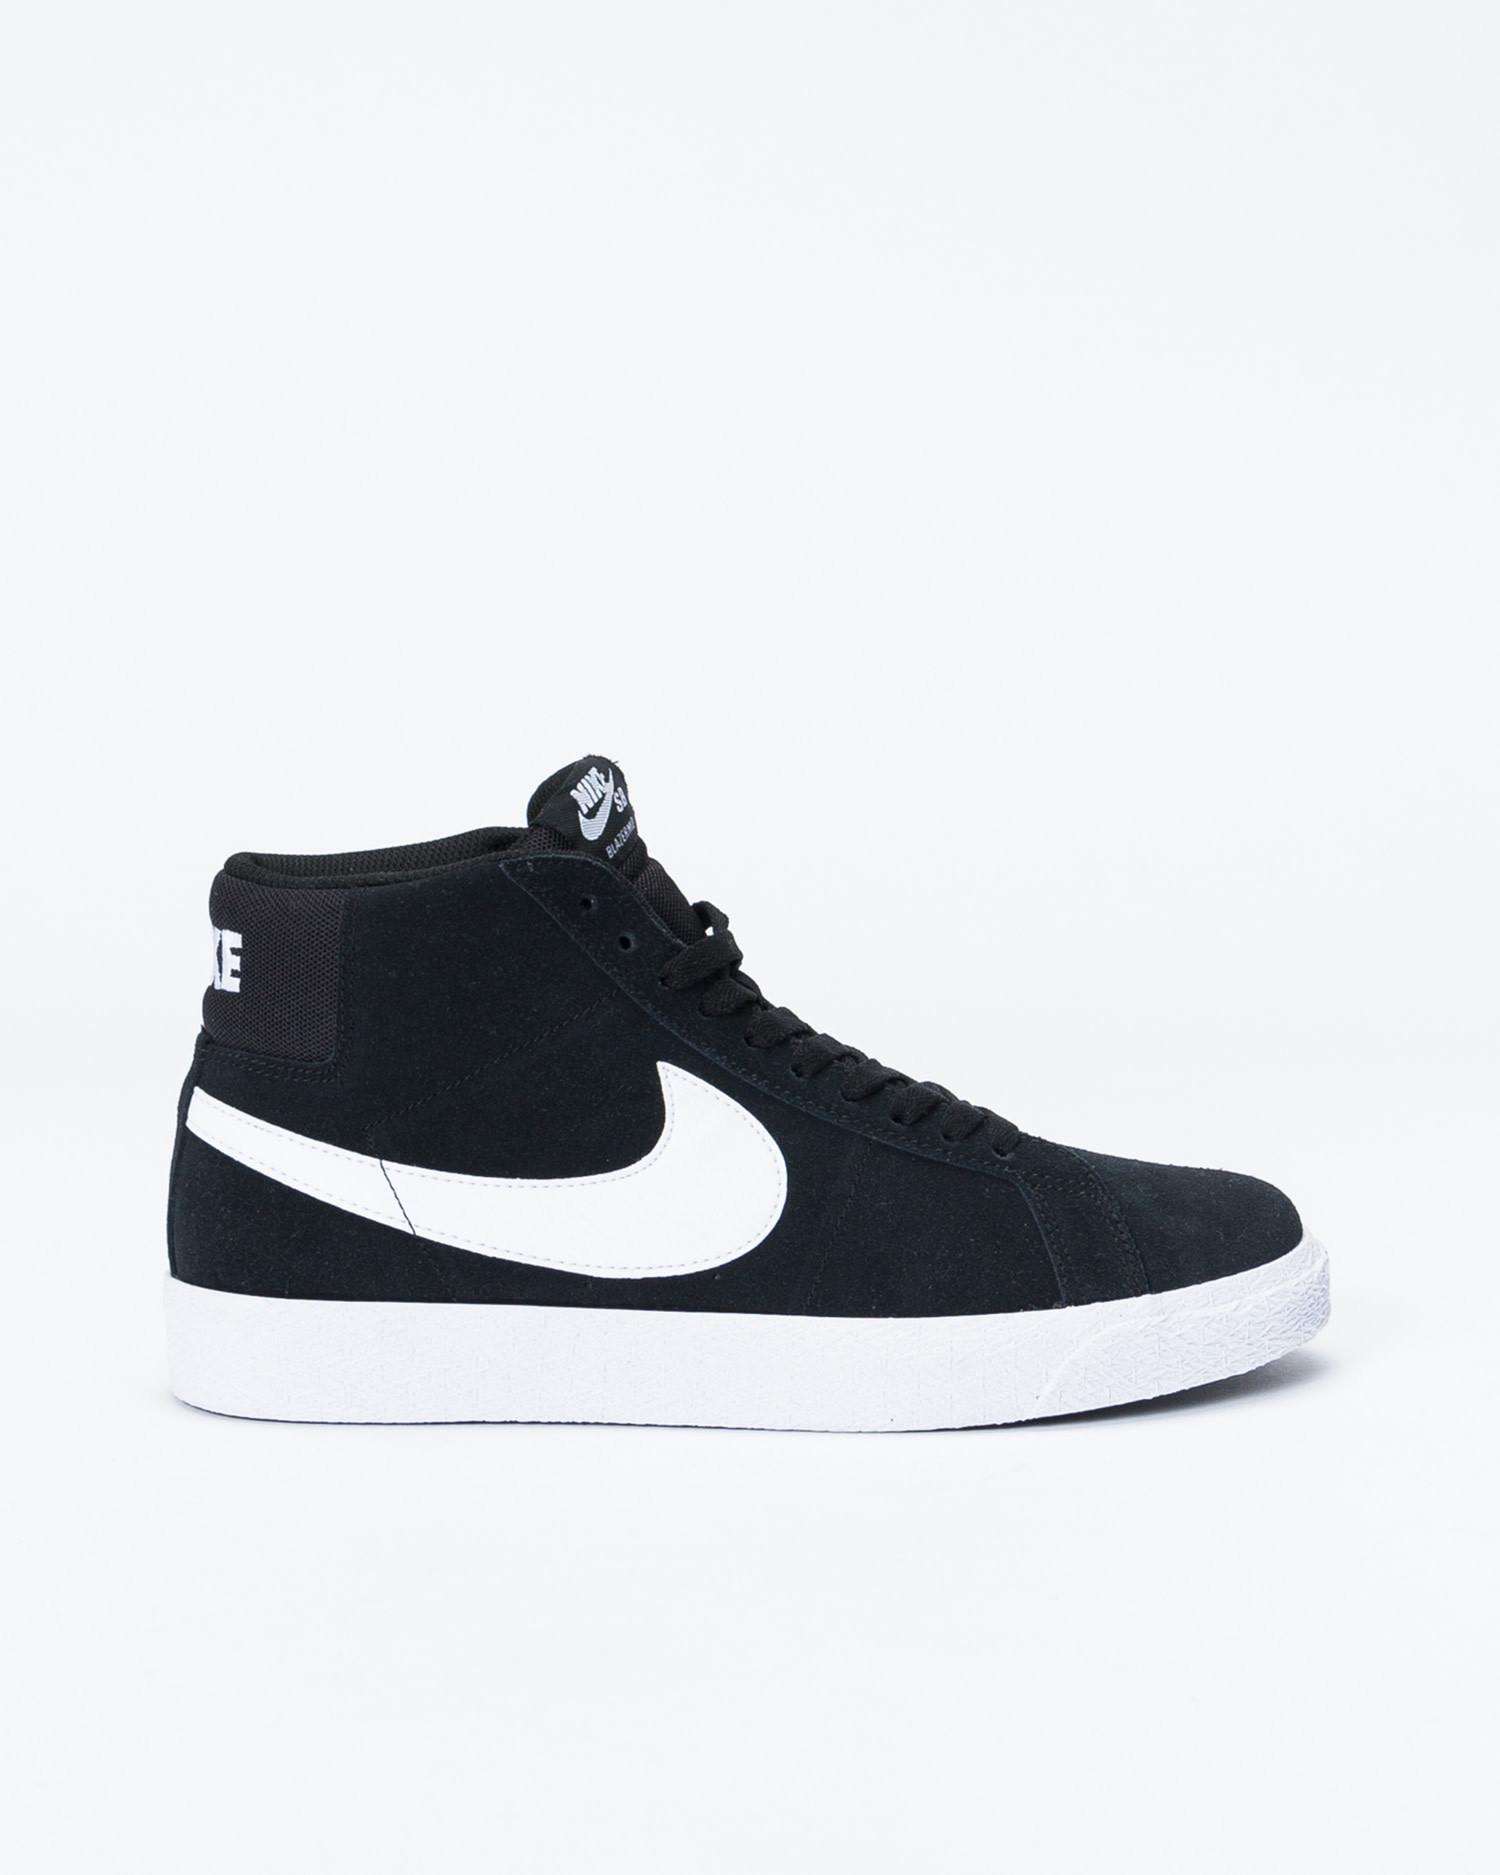 Nike SB Blazer Mid Black/White